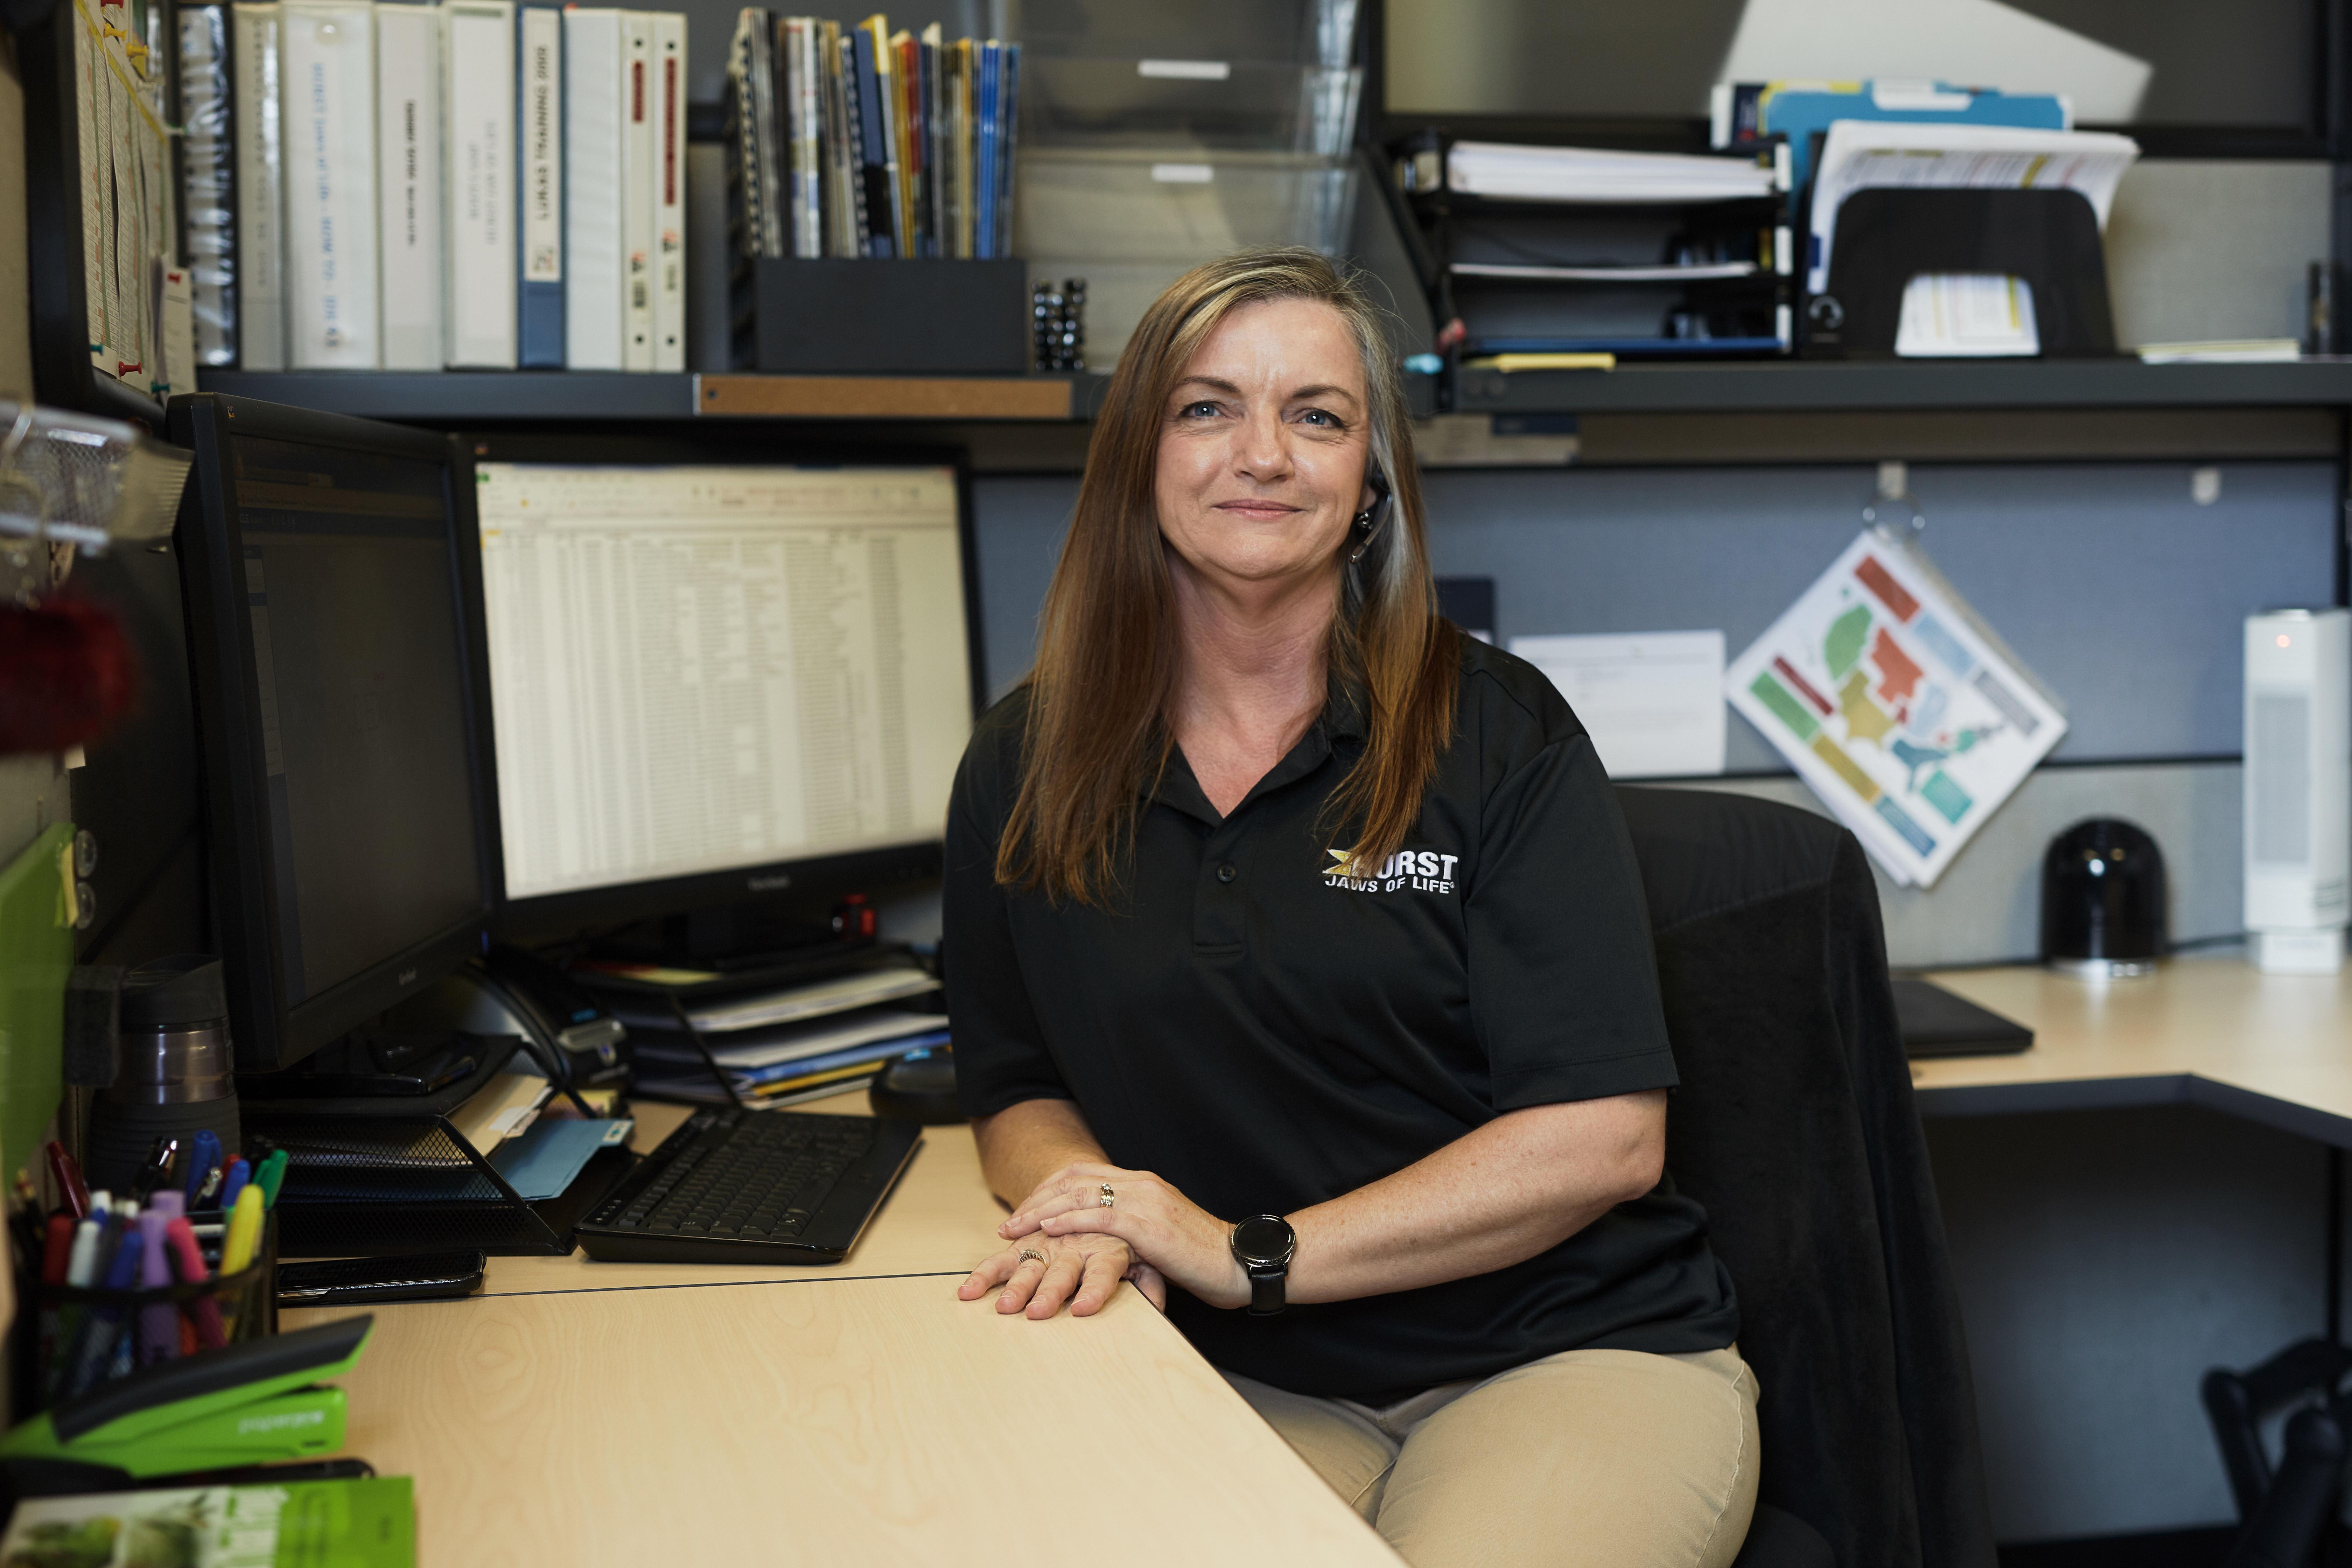 Tina Rippy, Customer Service Specialist